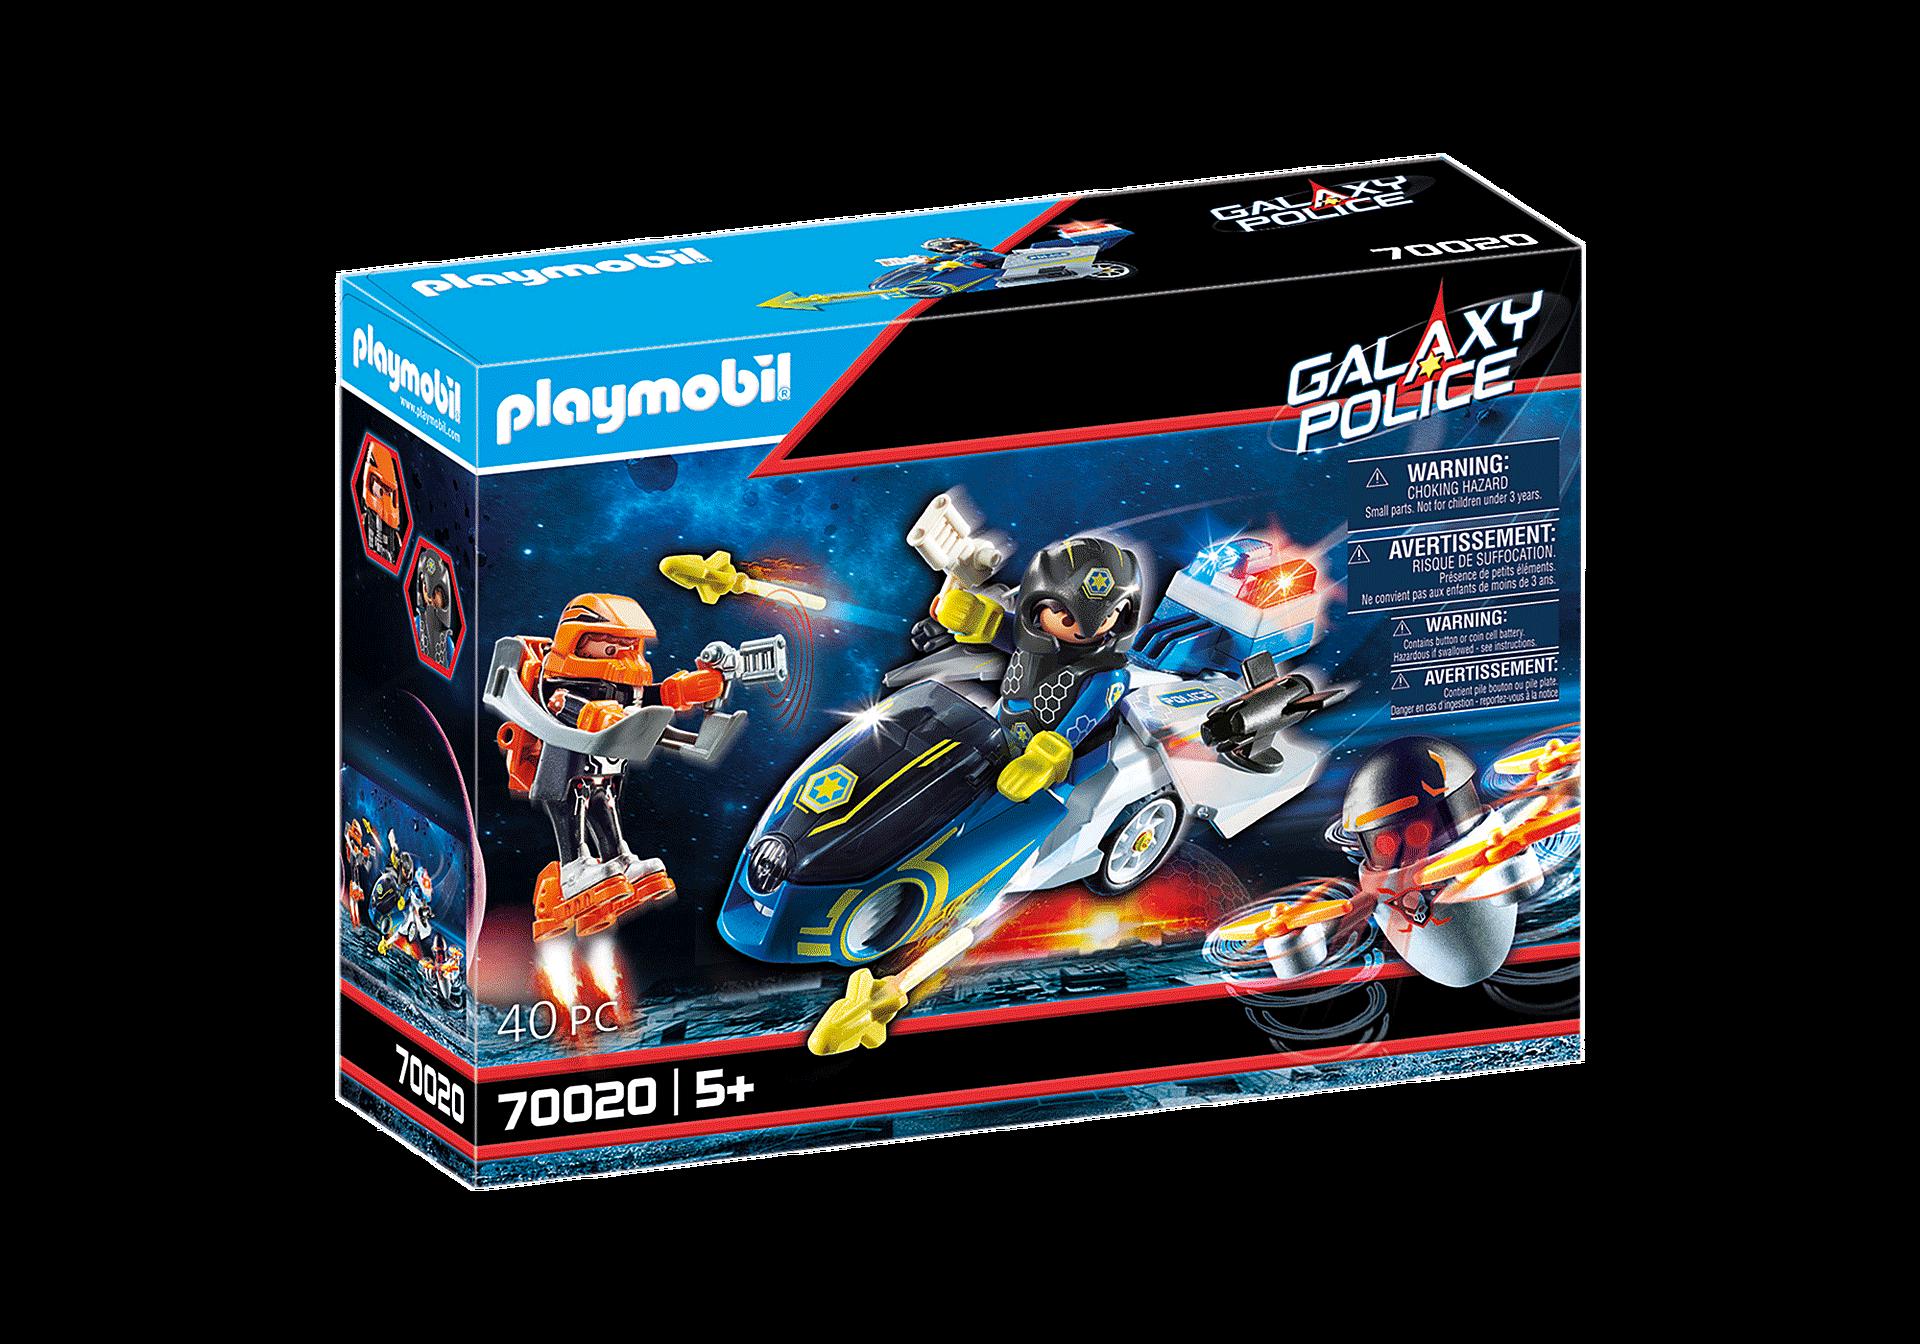 70020 Galaxy polismotorcykel zoom image2